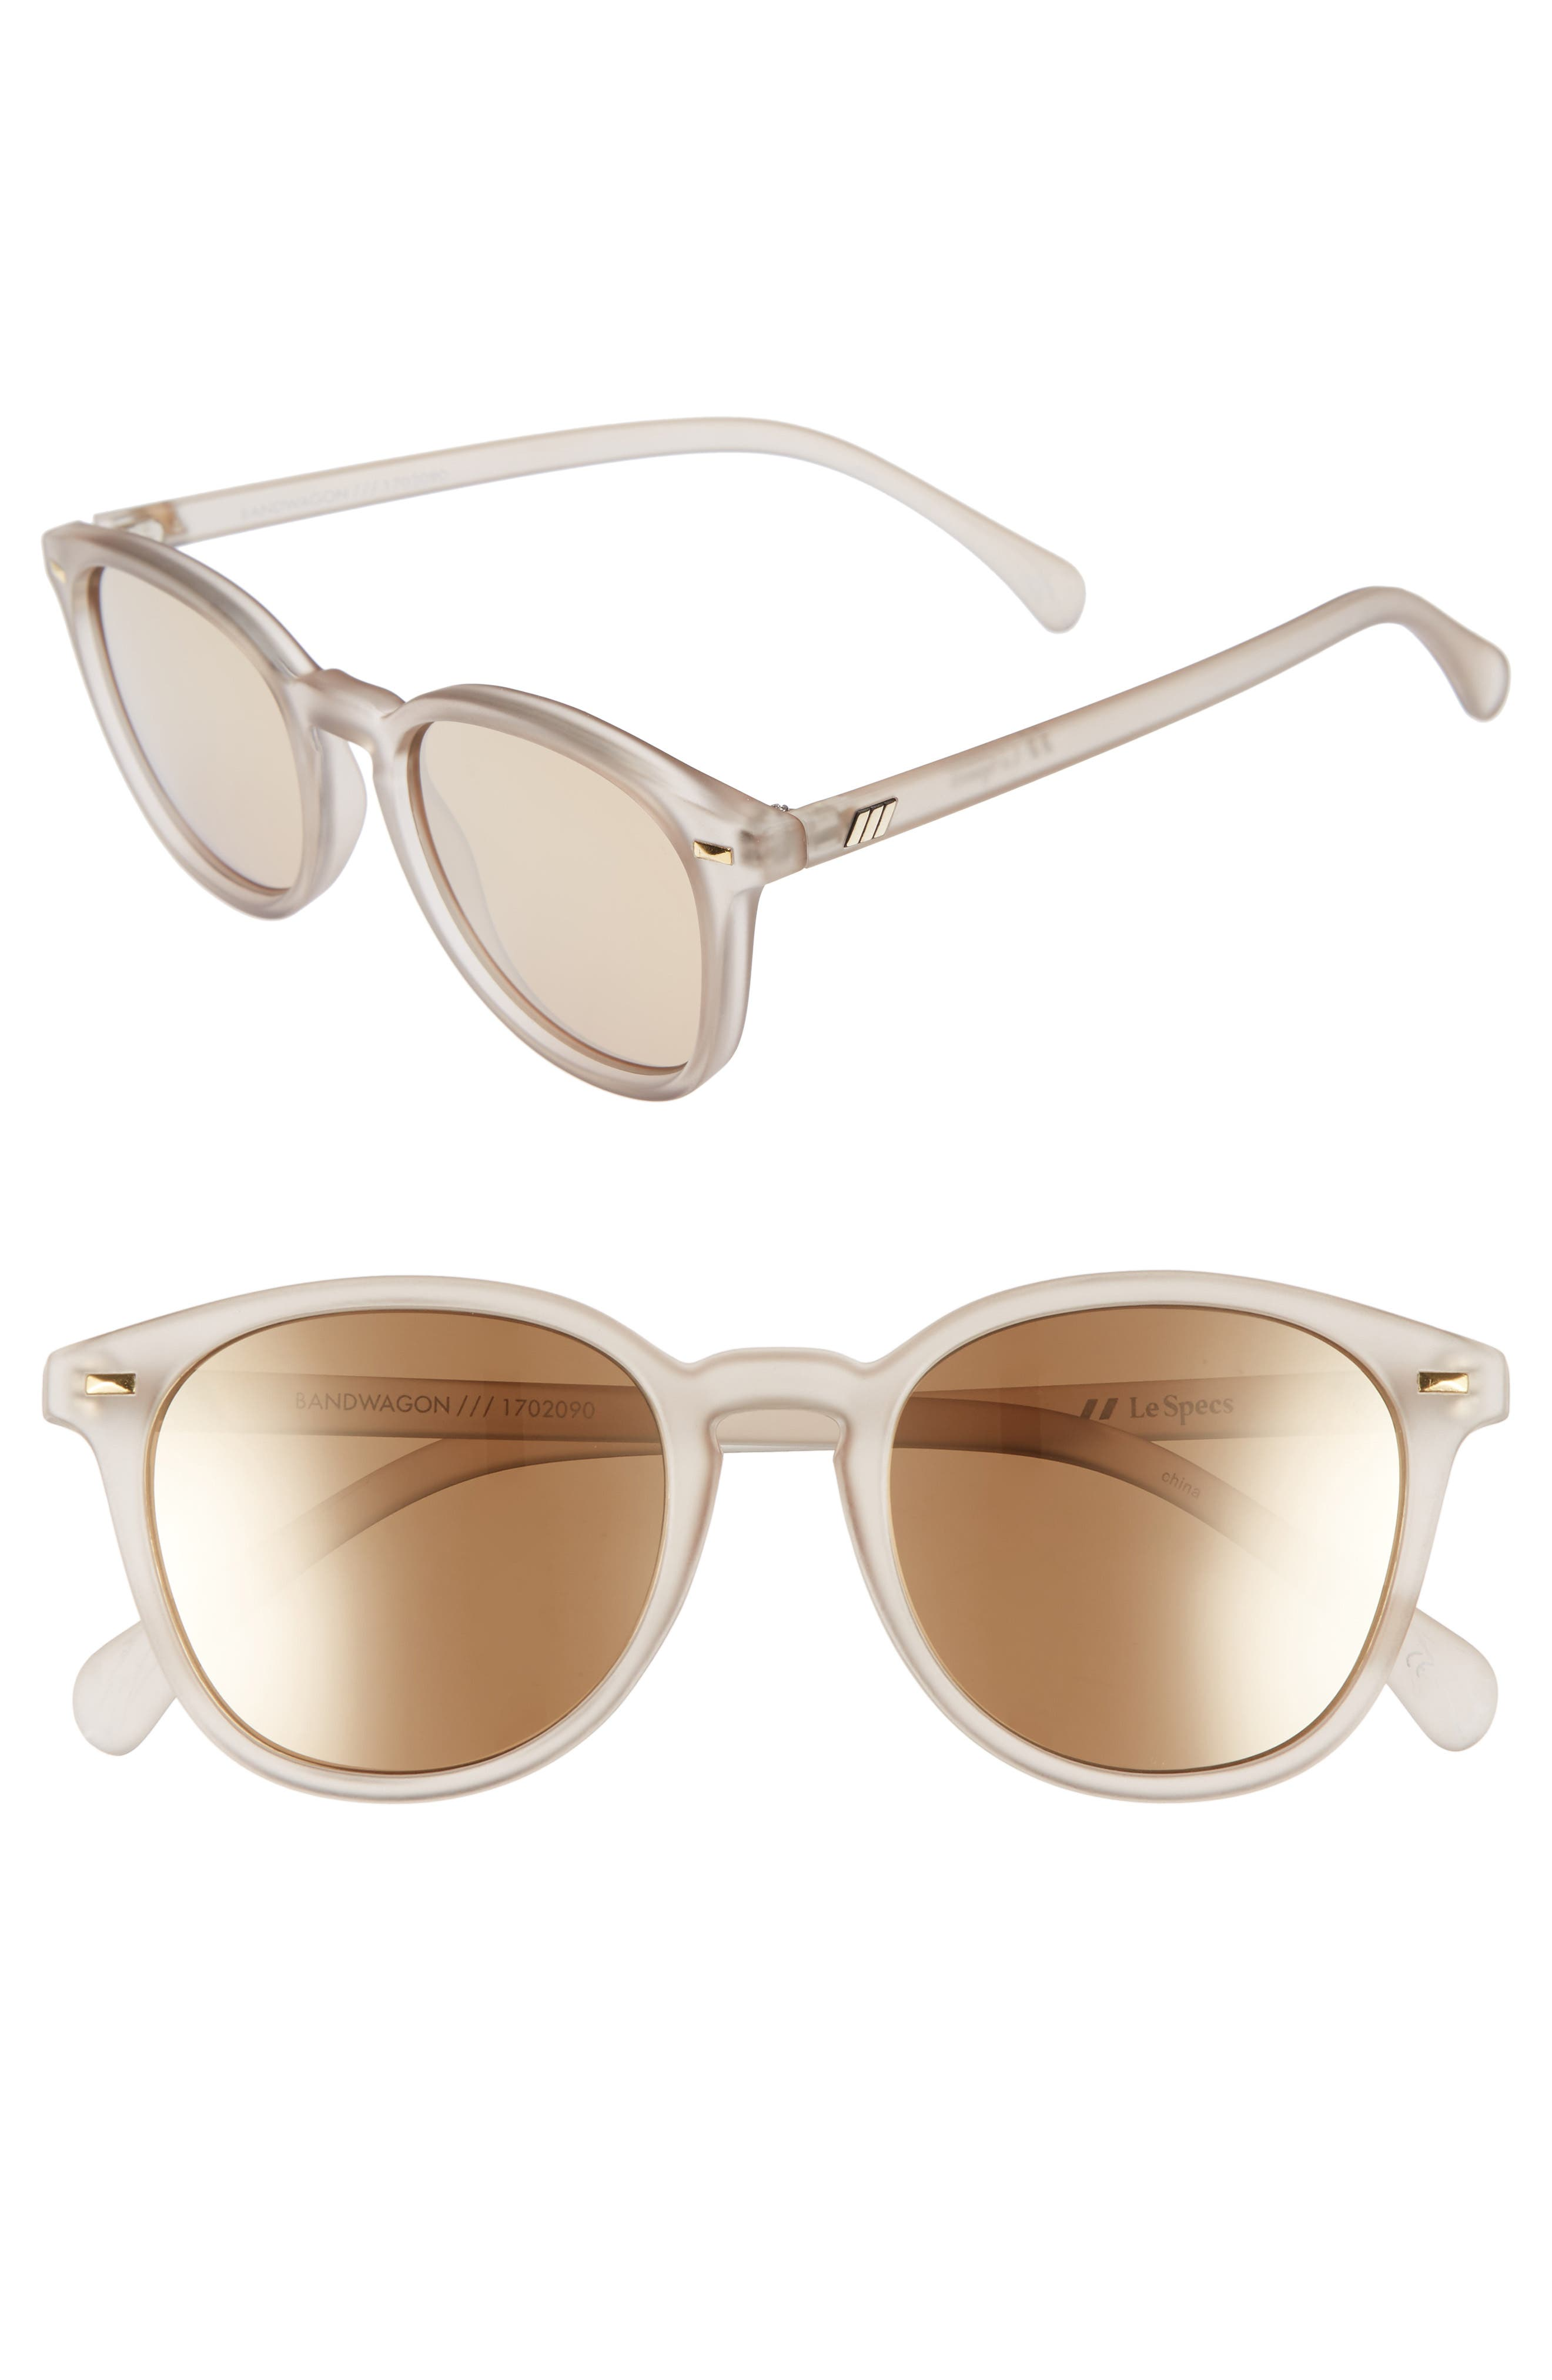 'Bandwagon' 51mm Sunglasses,                             Main thumbnail 1, color,                             Matte Stone